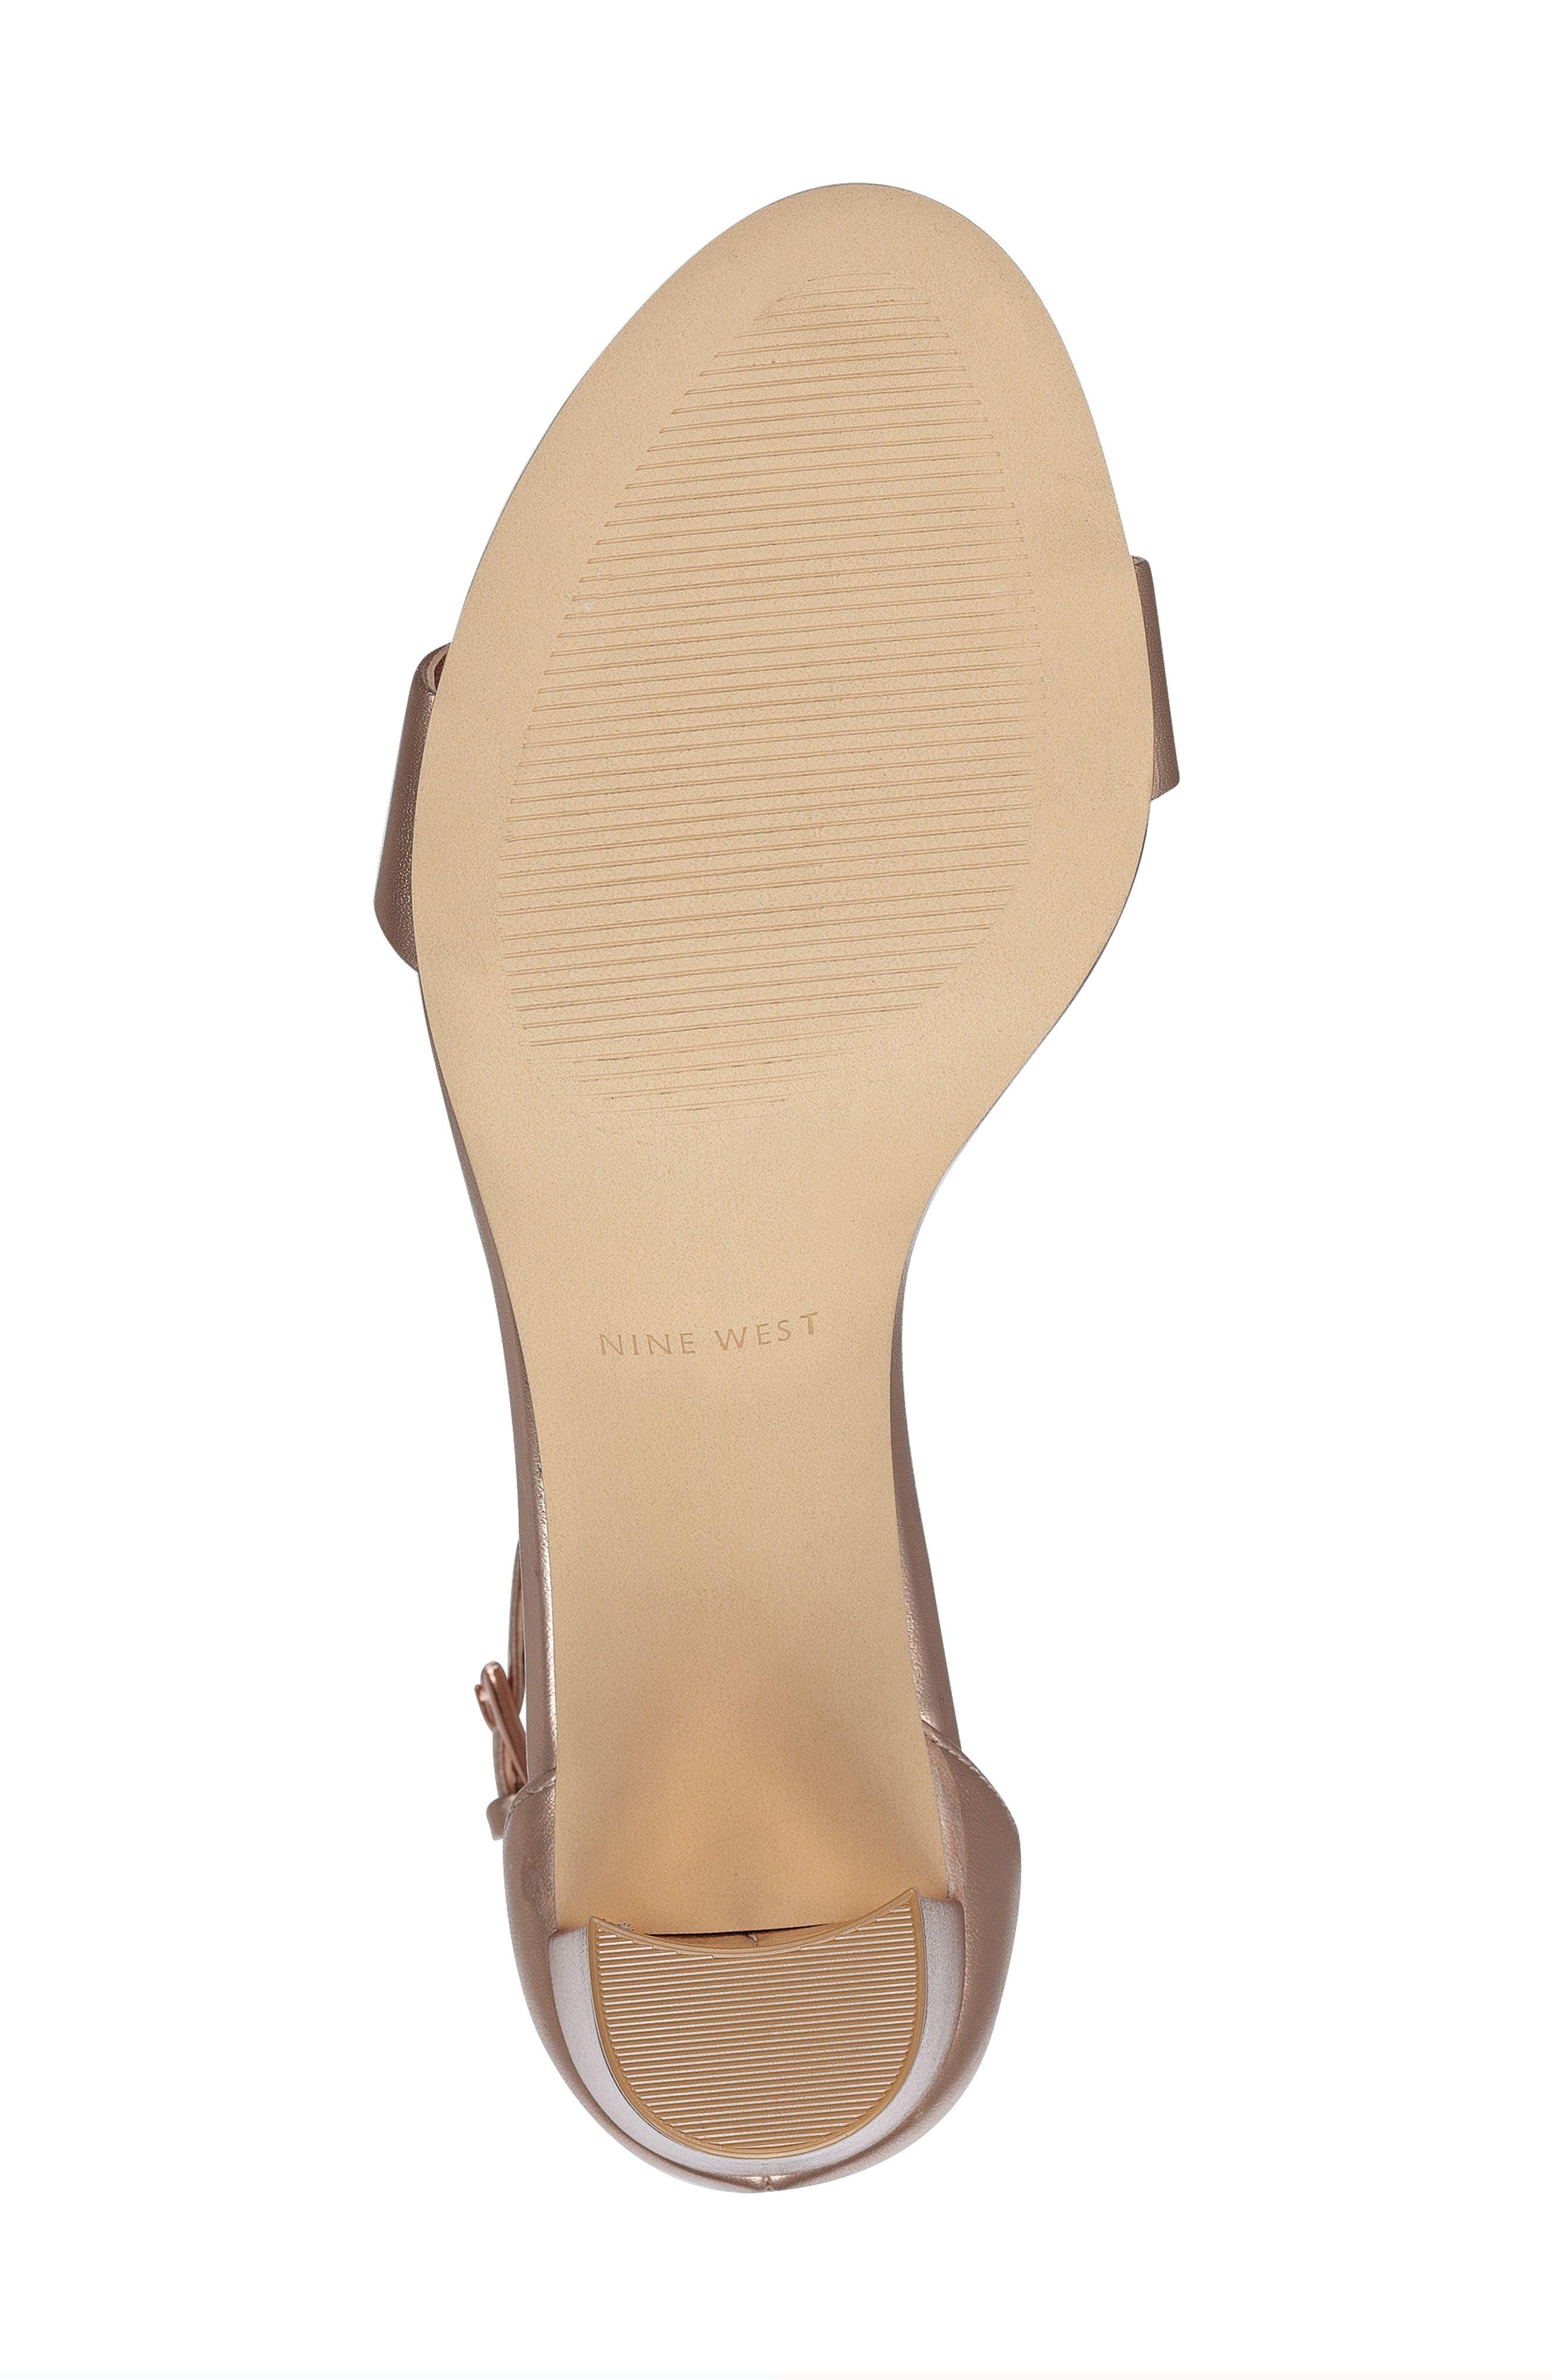 Pruce Ankle Strap Sandal,                             Alternate thumbnail 6, color,                             Matte Rose Gold